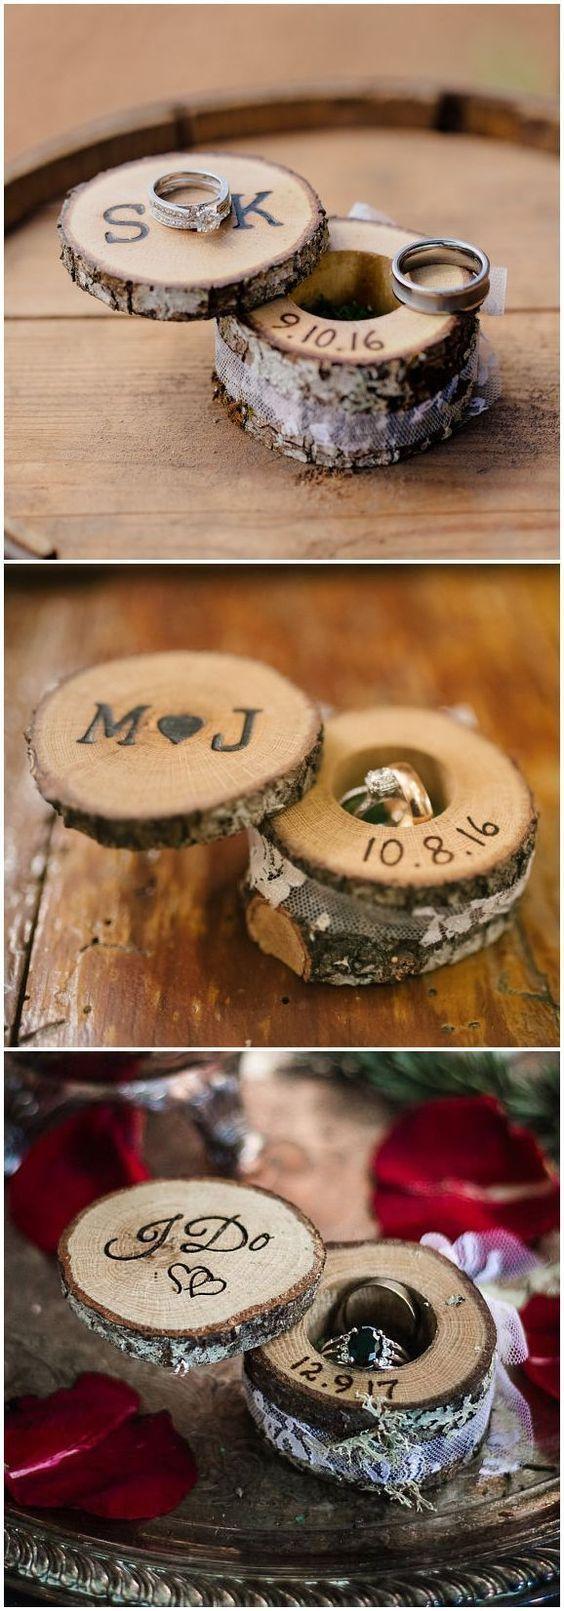 Rustic Tree Stump Wedding Ring Holder Ideas Www Deerpearlflow Rustic Rusticwedding Countrywedding Weddingideas Wedding Idees De Mariage Deco Mariage